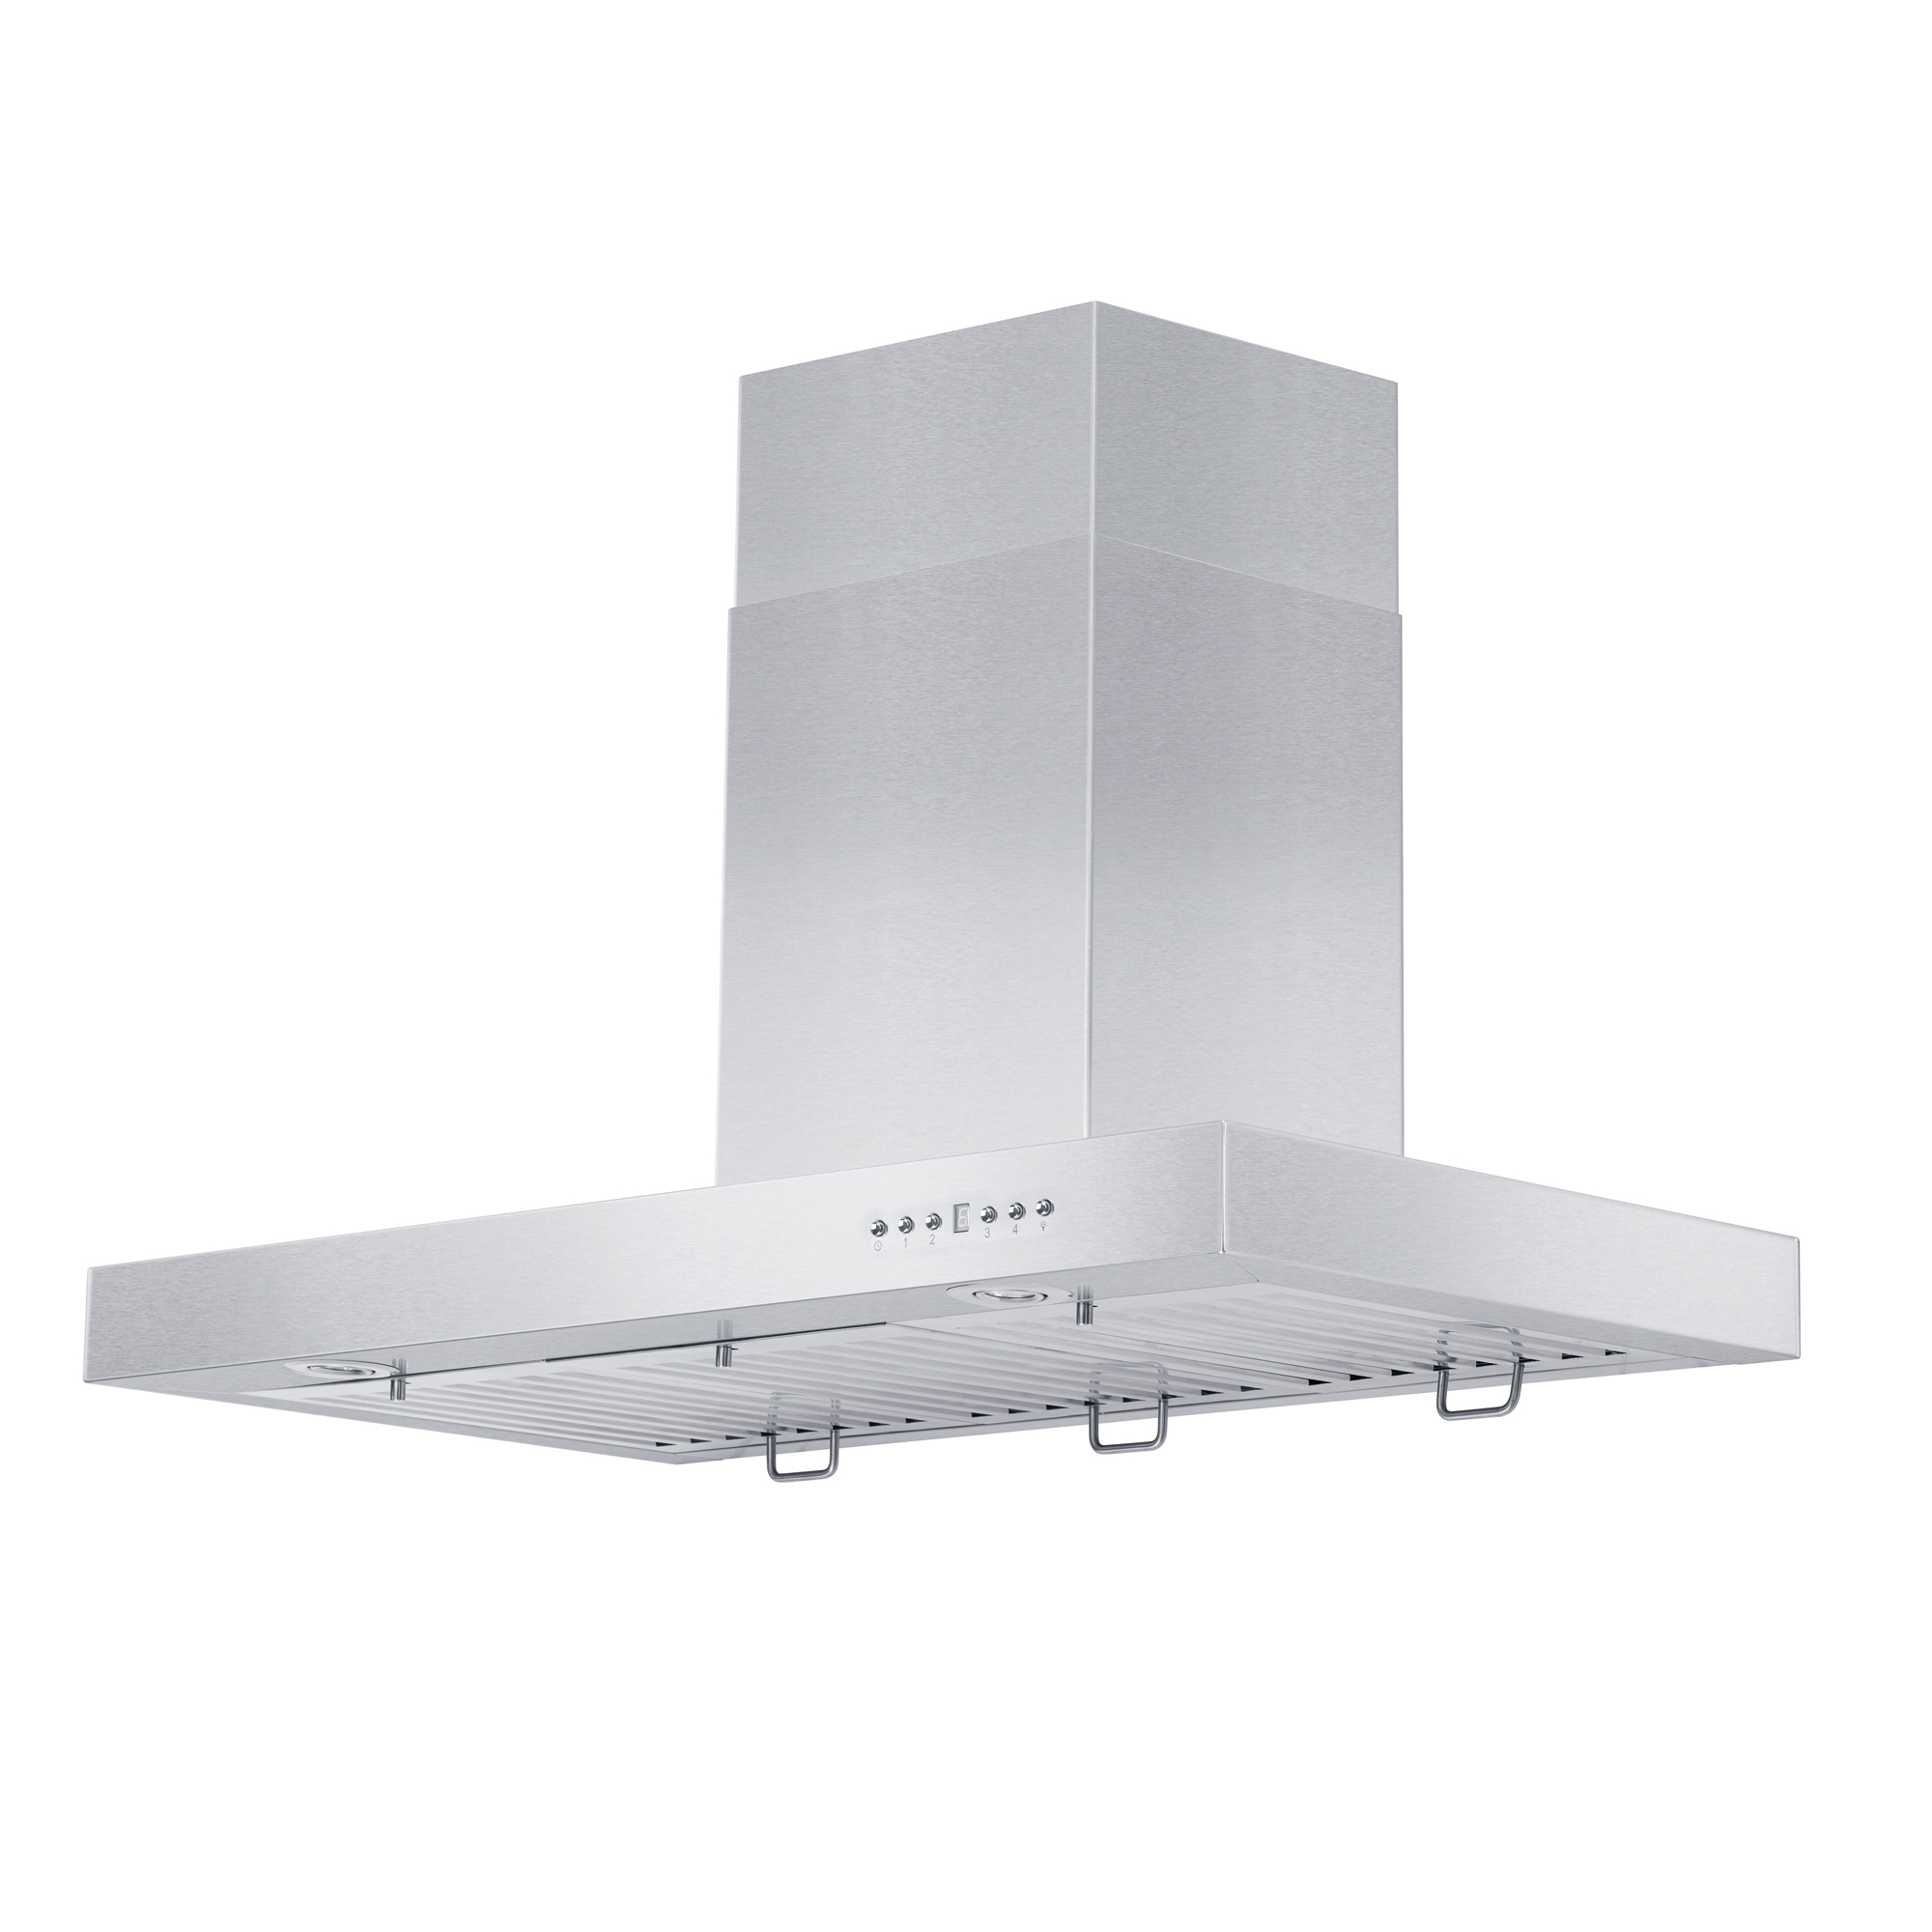 zline-stainless-steel-wall-mounted-range-hood-KE-new-angle-under.jpg